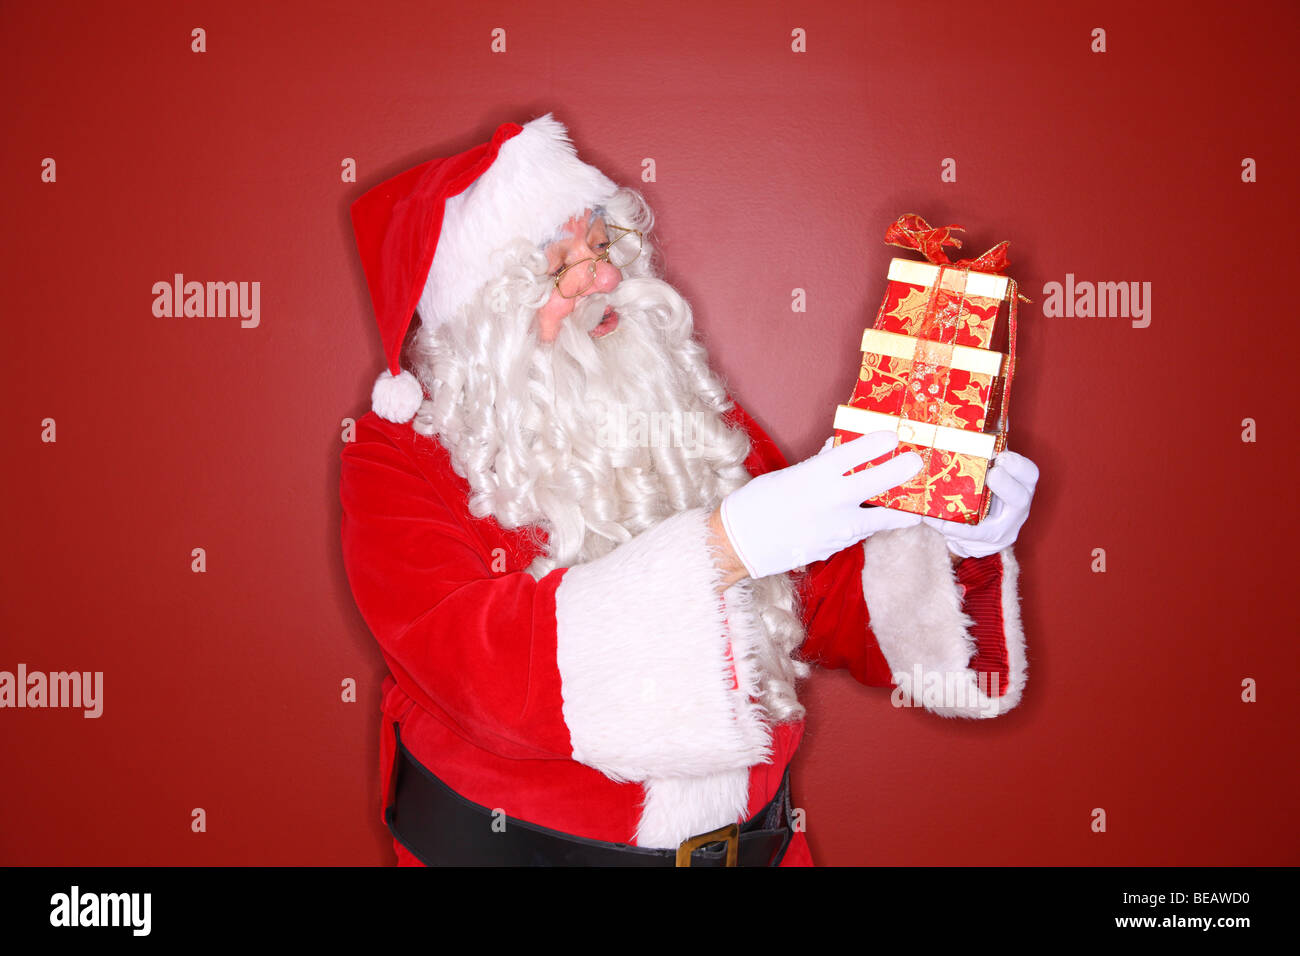 Santa celebración presente Imagen De Stock